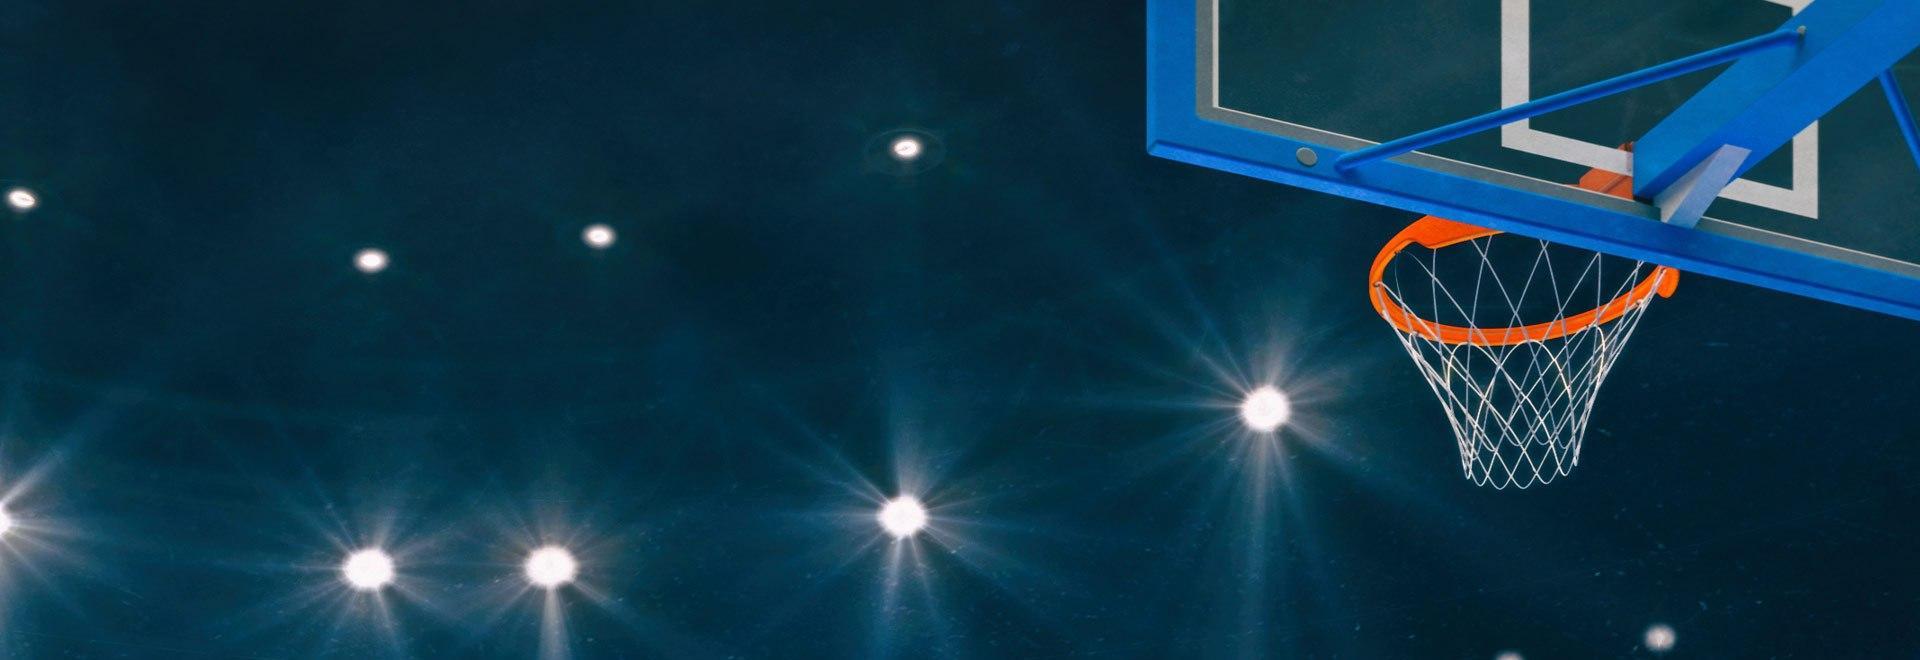 2012 NBA